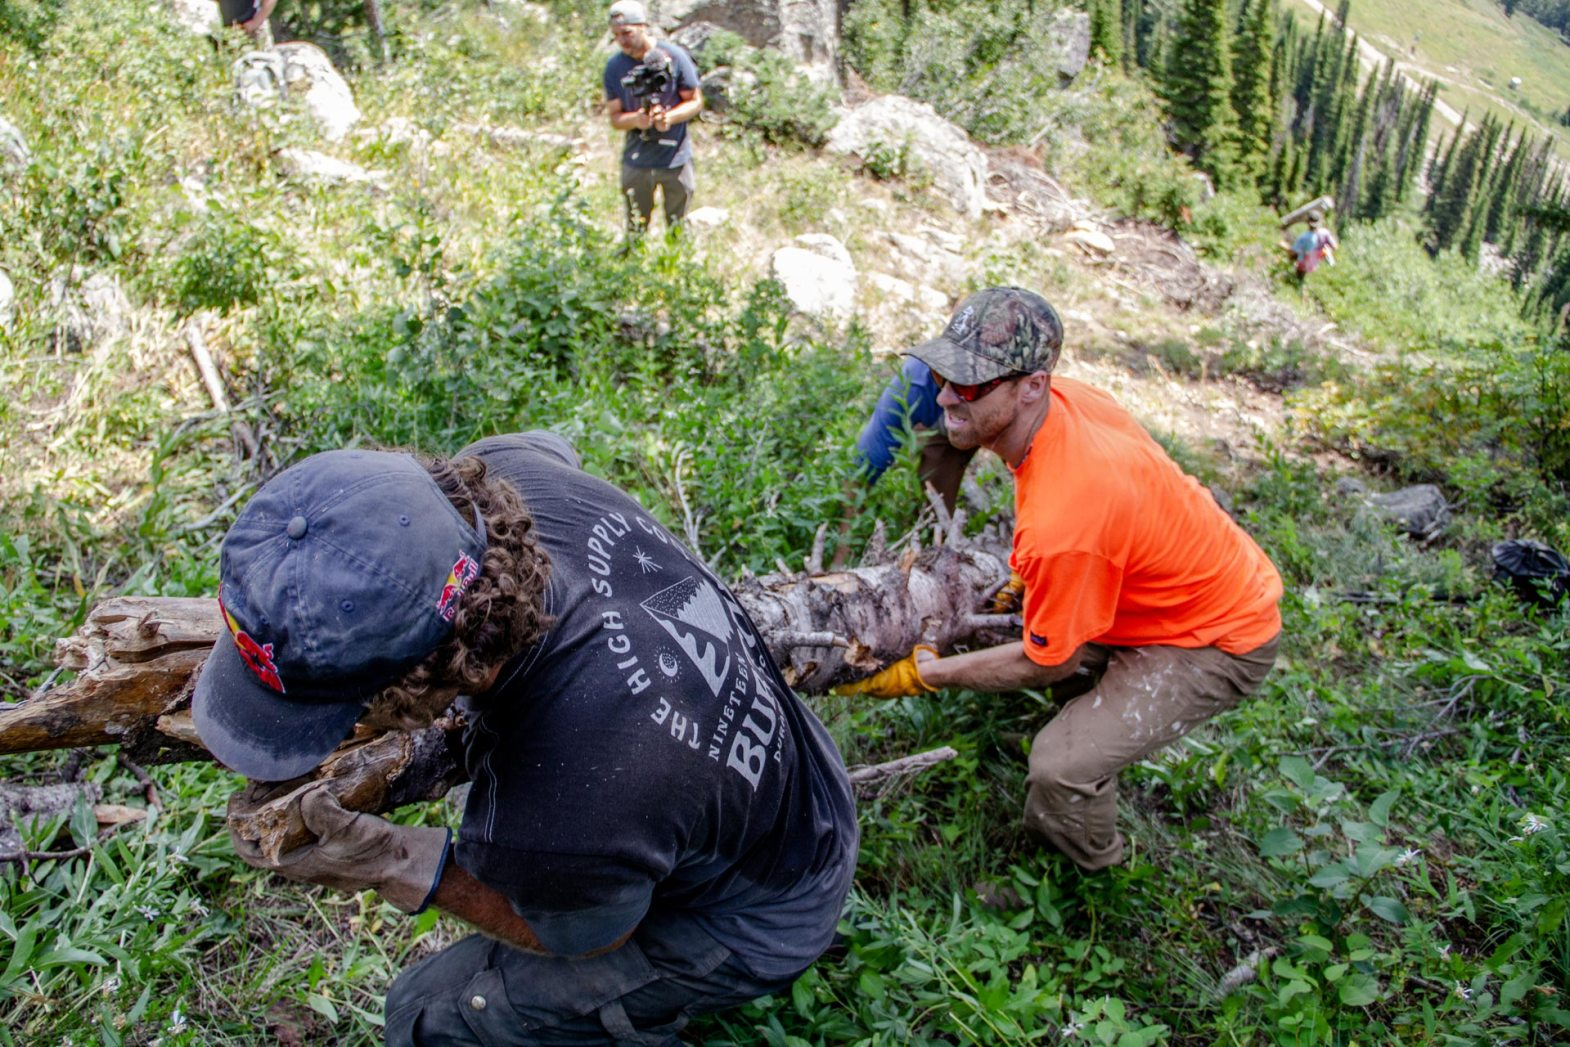 Ben Ferguson and Sage Kotsenburg haulin' logs. Photo: Ryan Dee